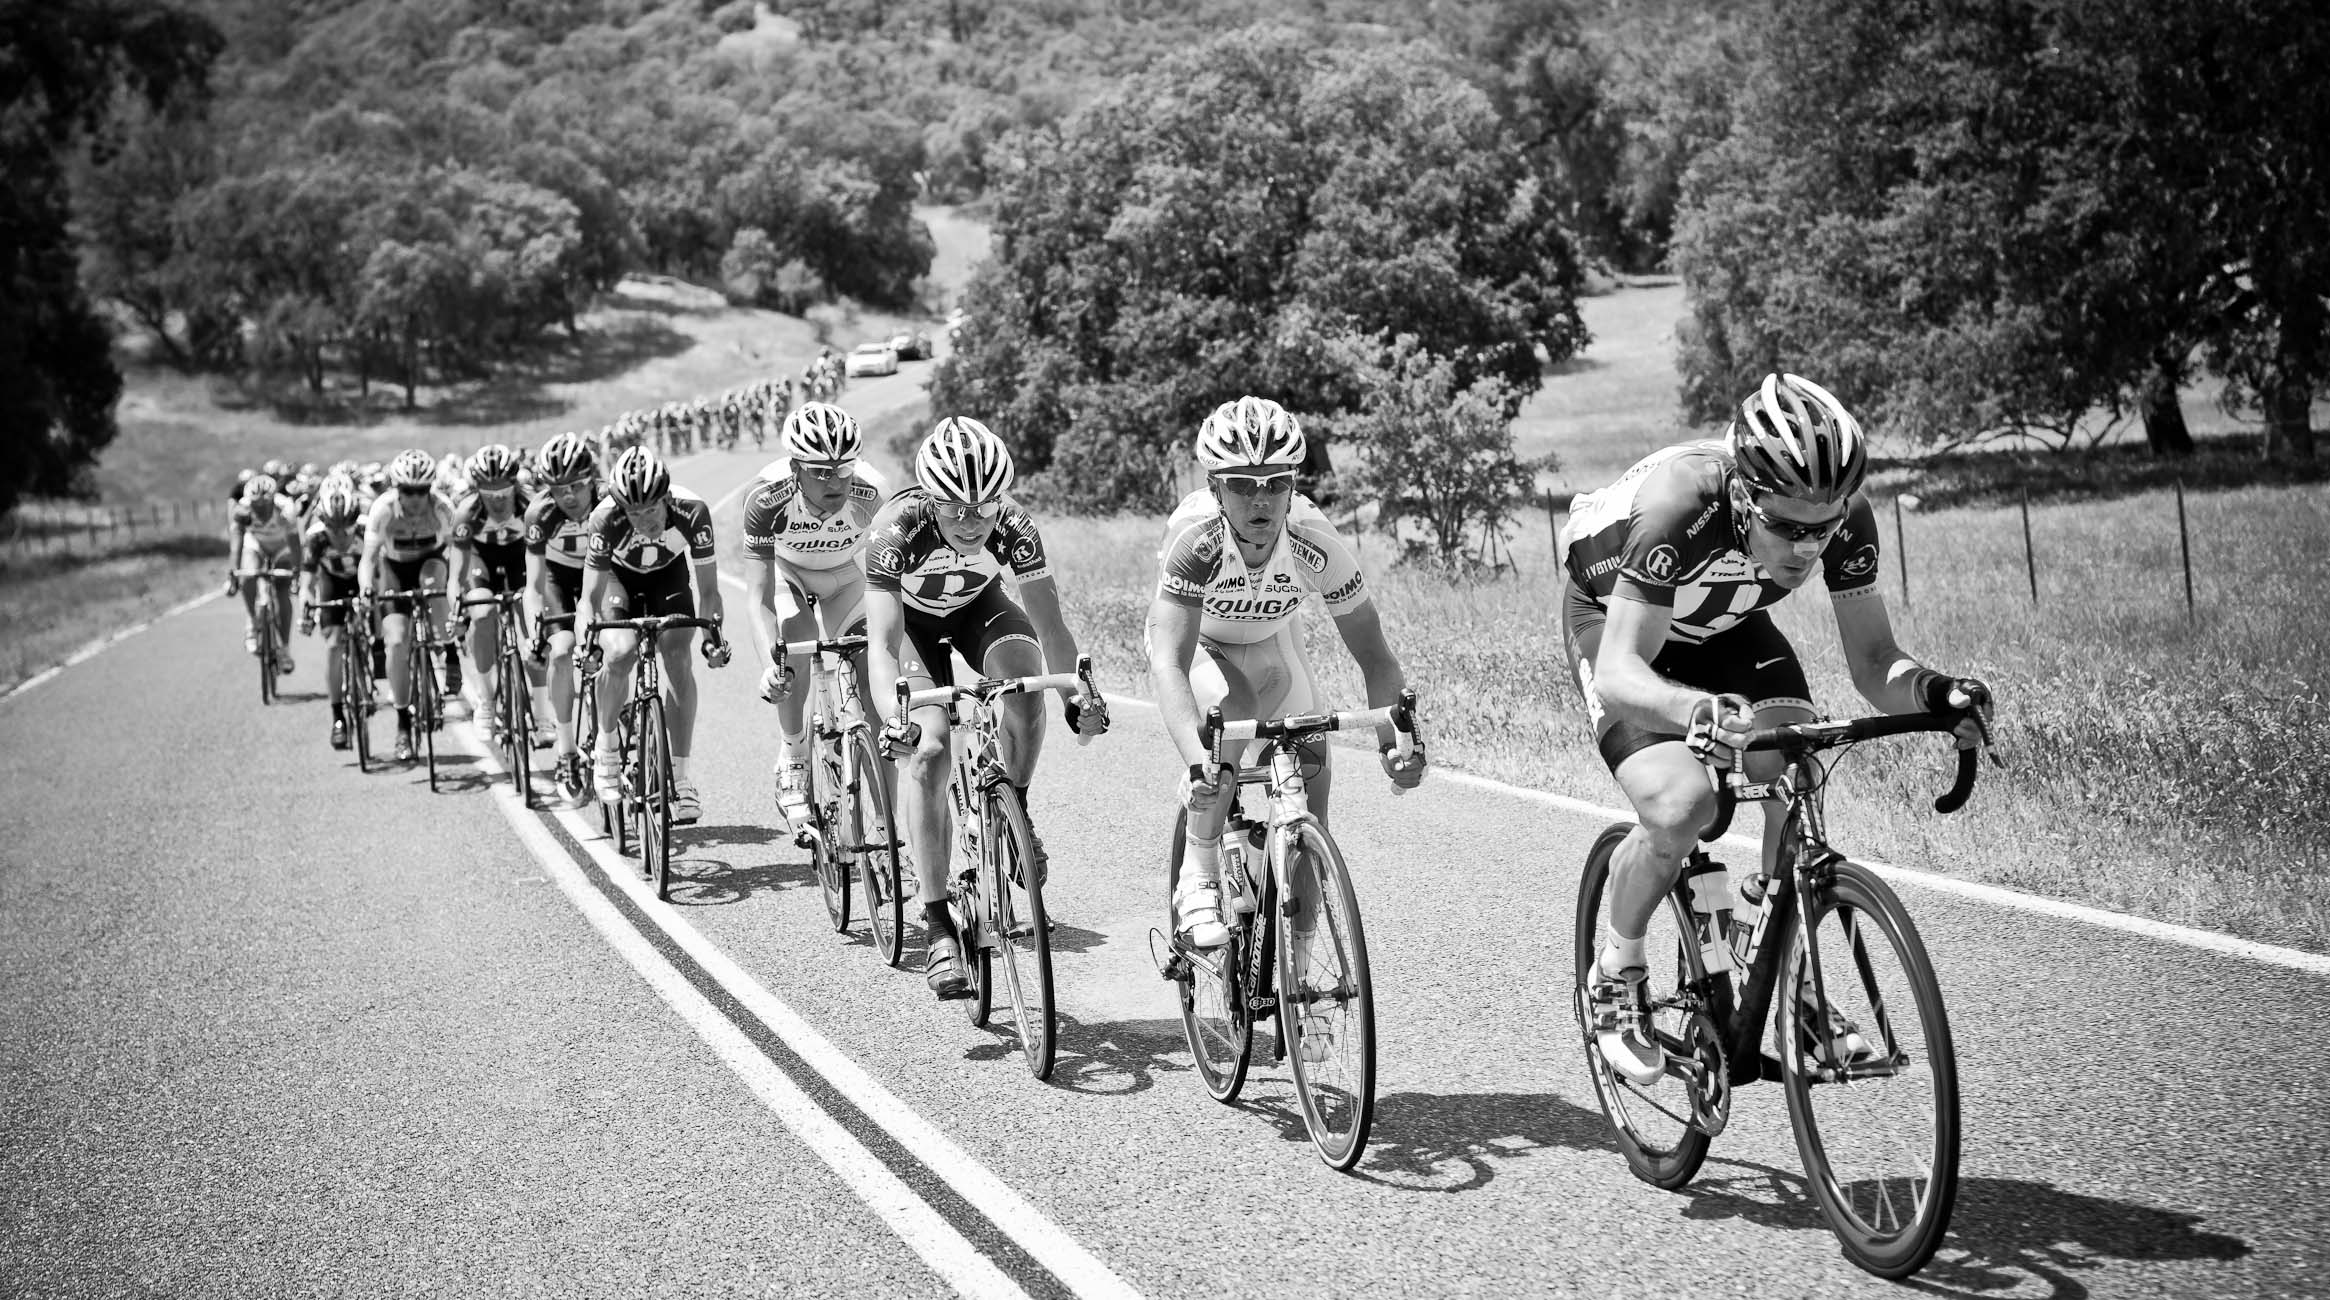 the Tour of California peloton puts the hammer down